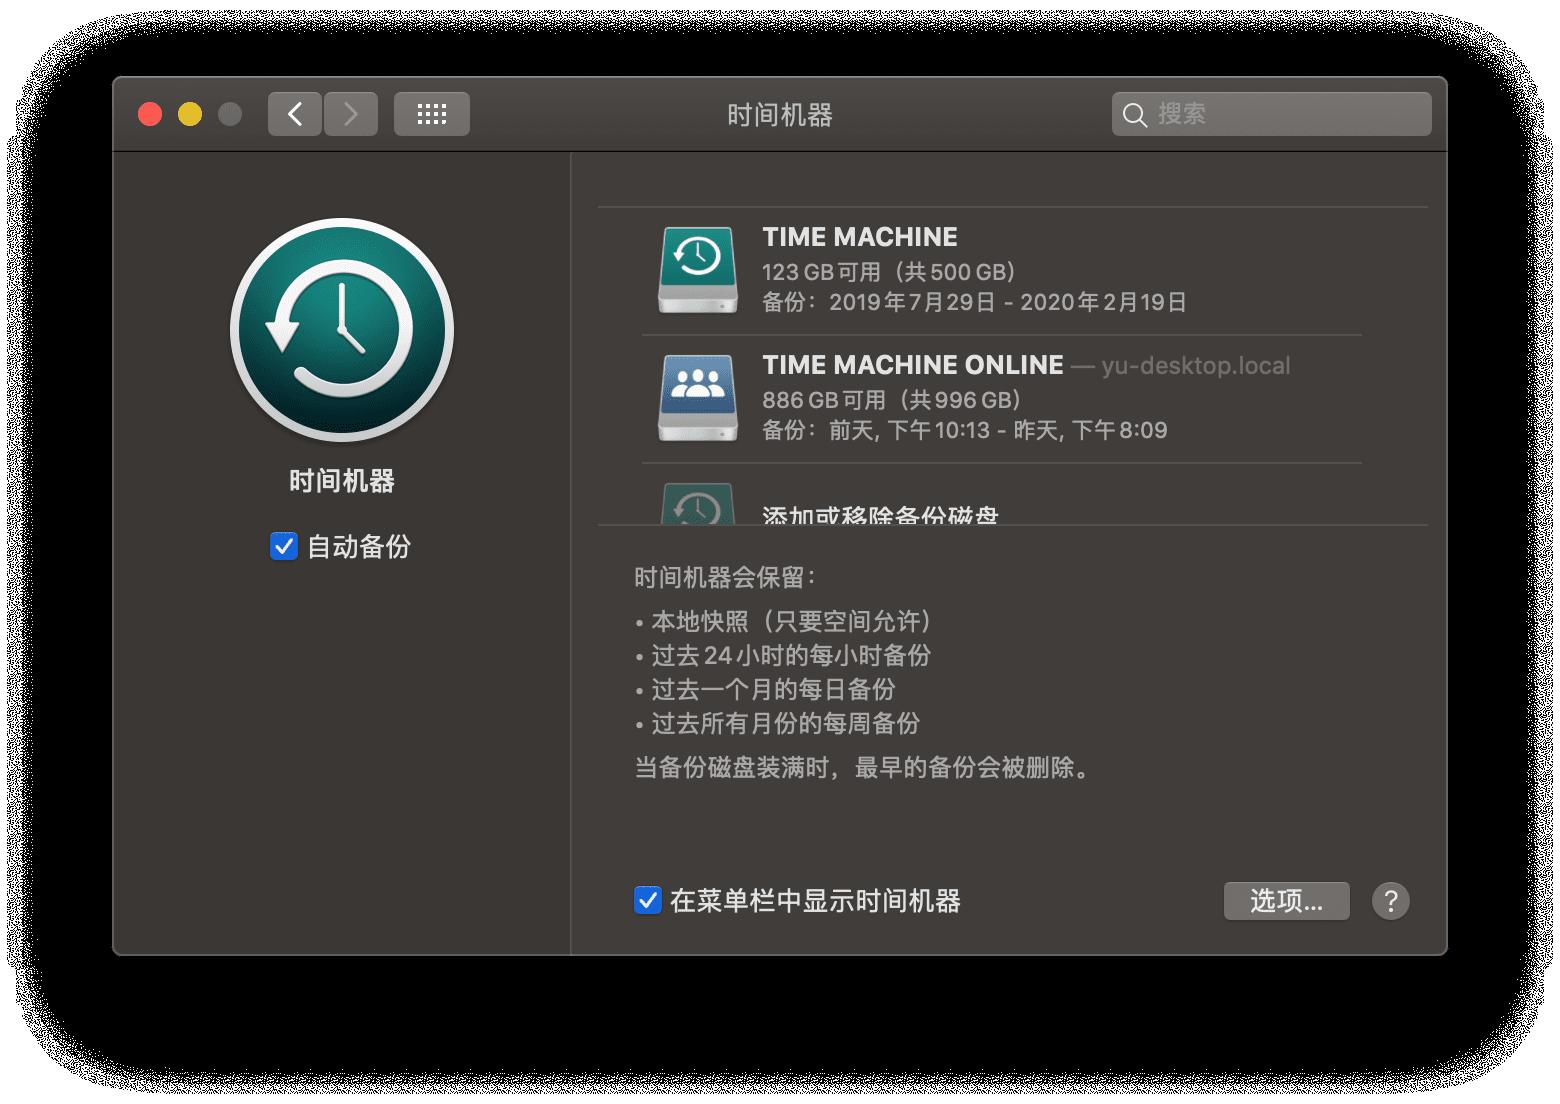 Mac删除时间机器备份